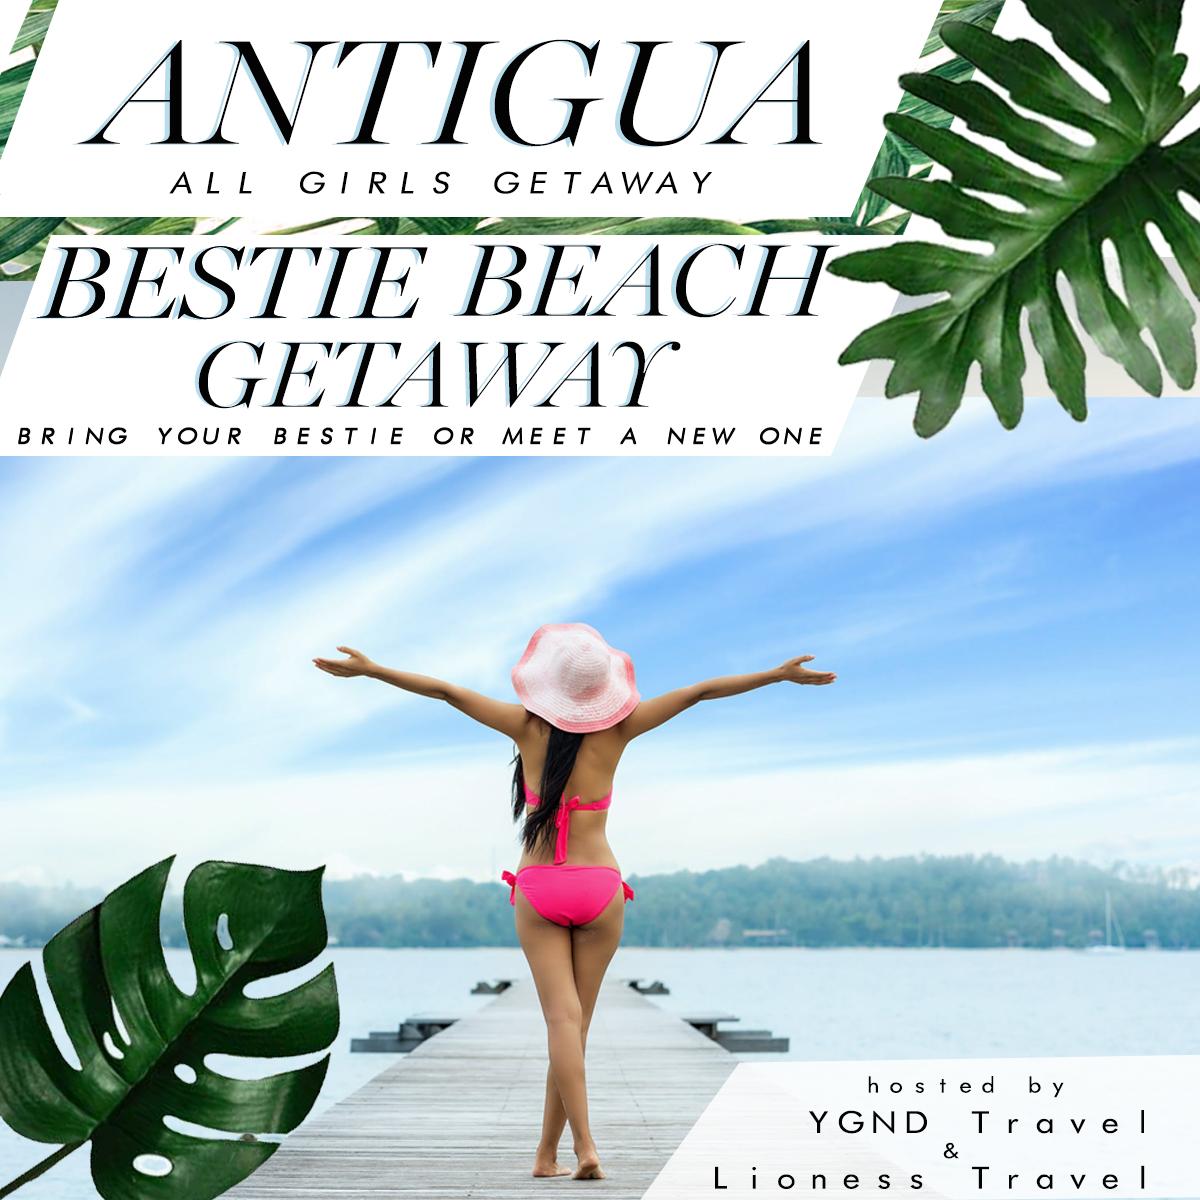 Antigua_Flyer_3.jpg